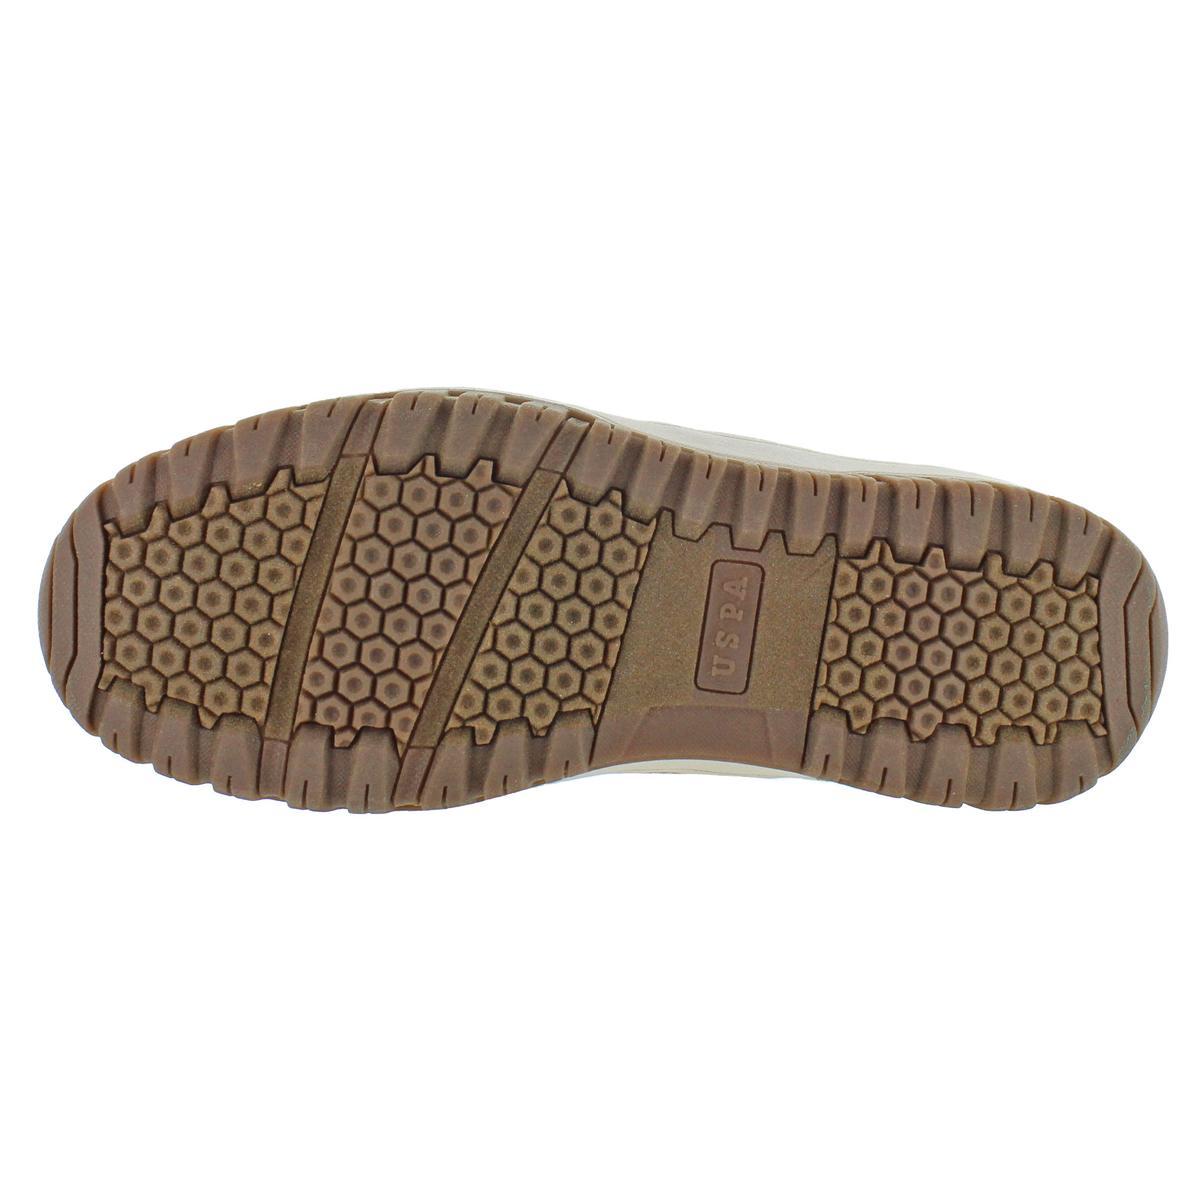 thumbnail 7 - U.S. Polo Assn. Bruno Men's Fashion Chukka Ankle Boots